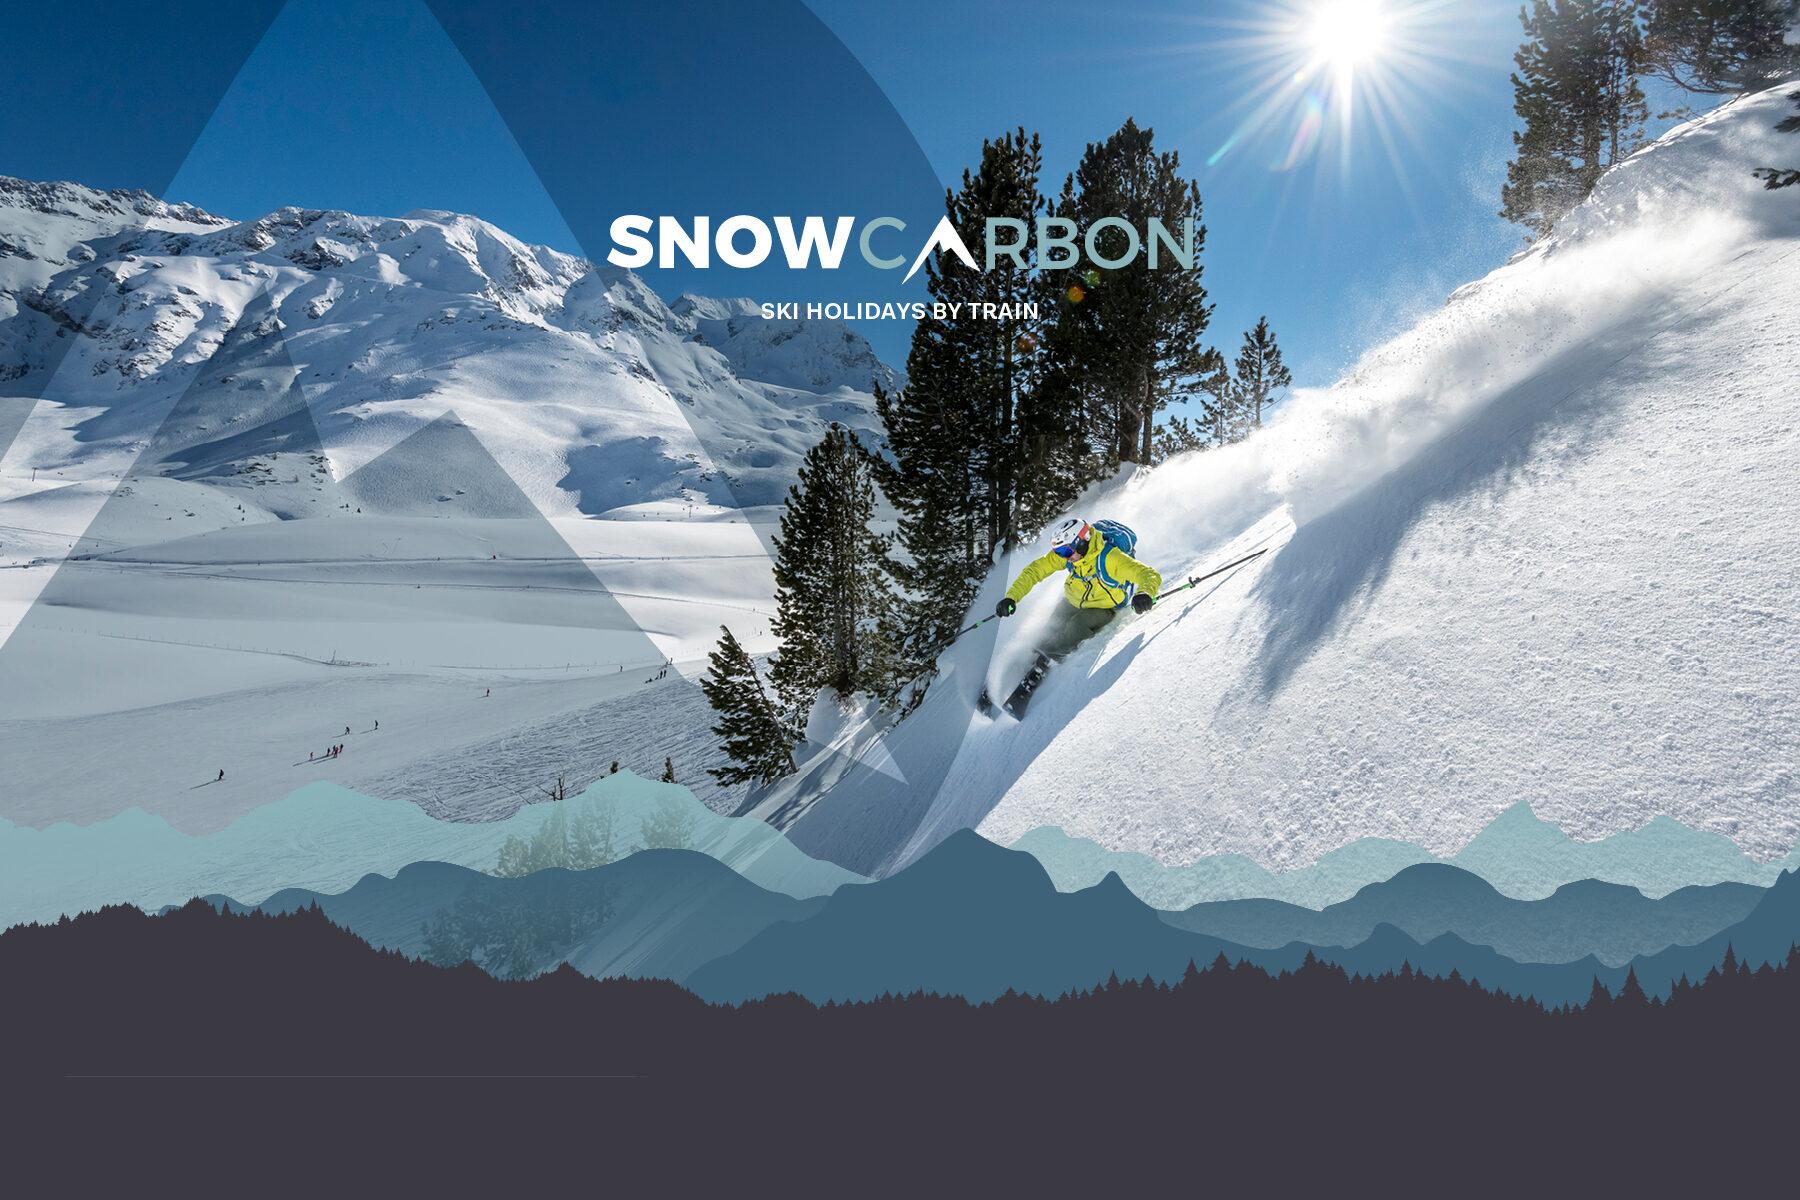 SNOWCARBON SLIDER